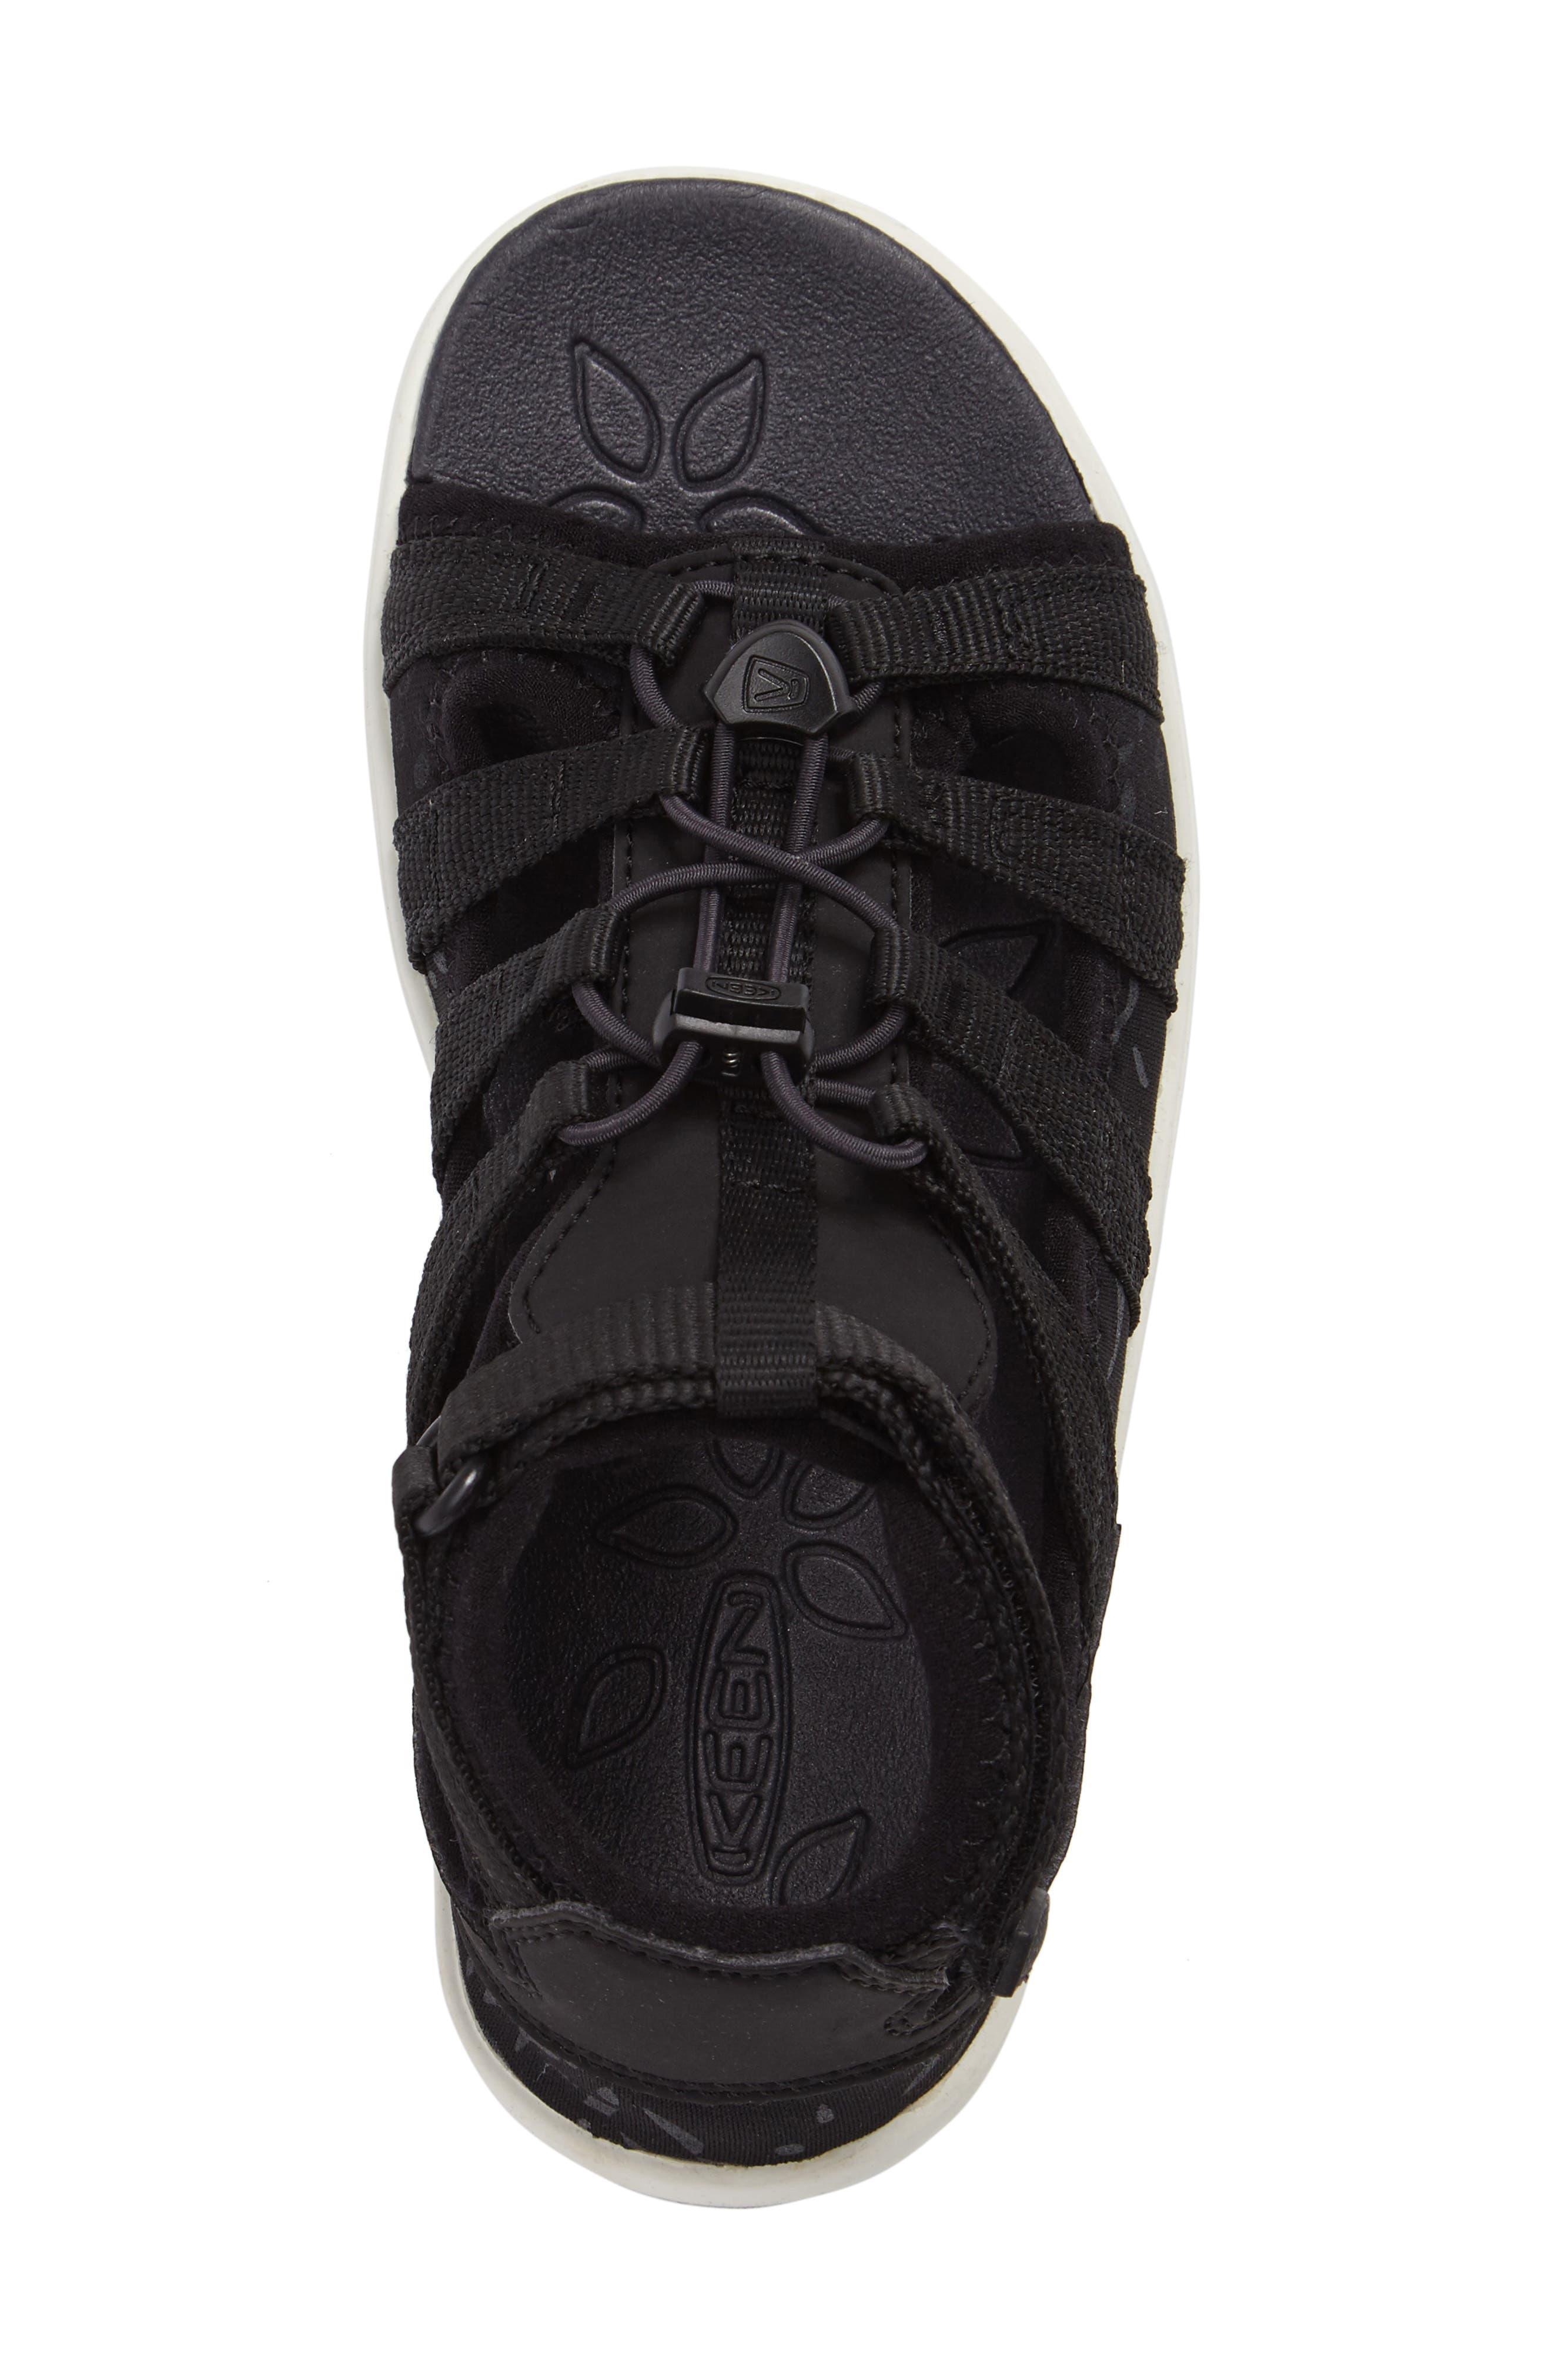 Hadley Adventure Water Friendly Sandal,                             Alternate thumbnail 5, color,                             Black/ White